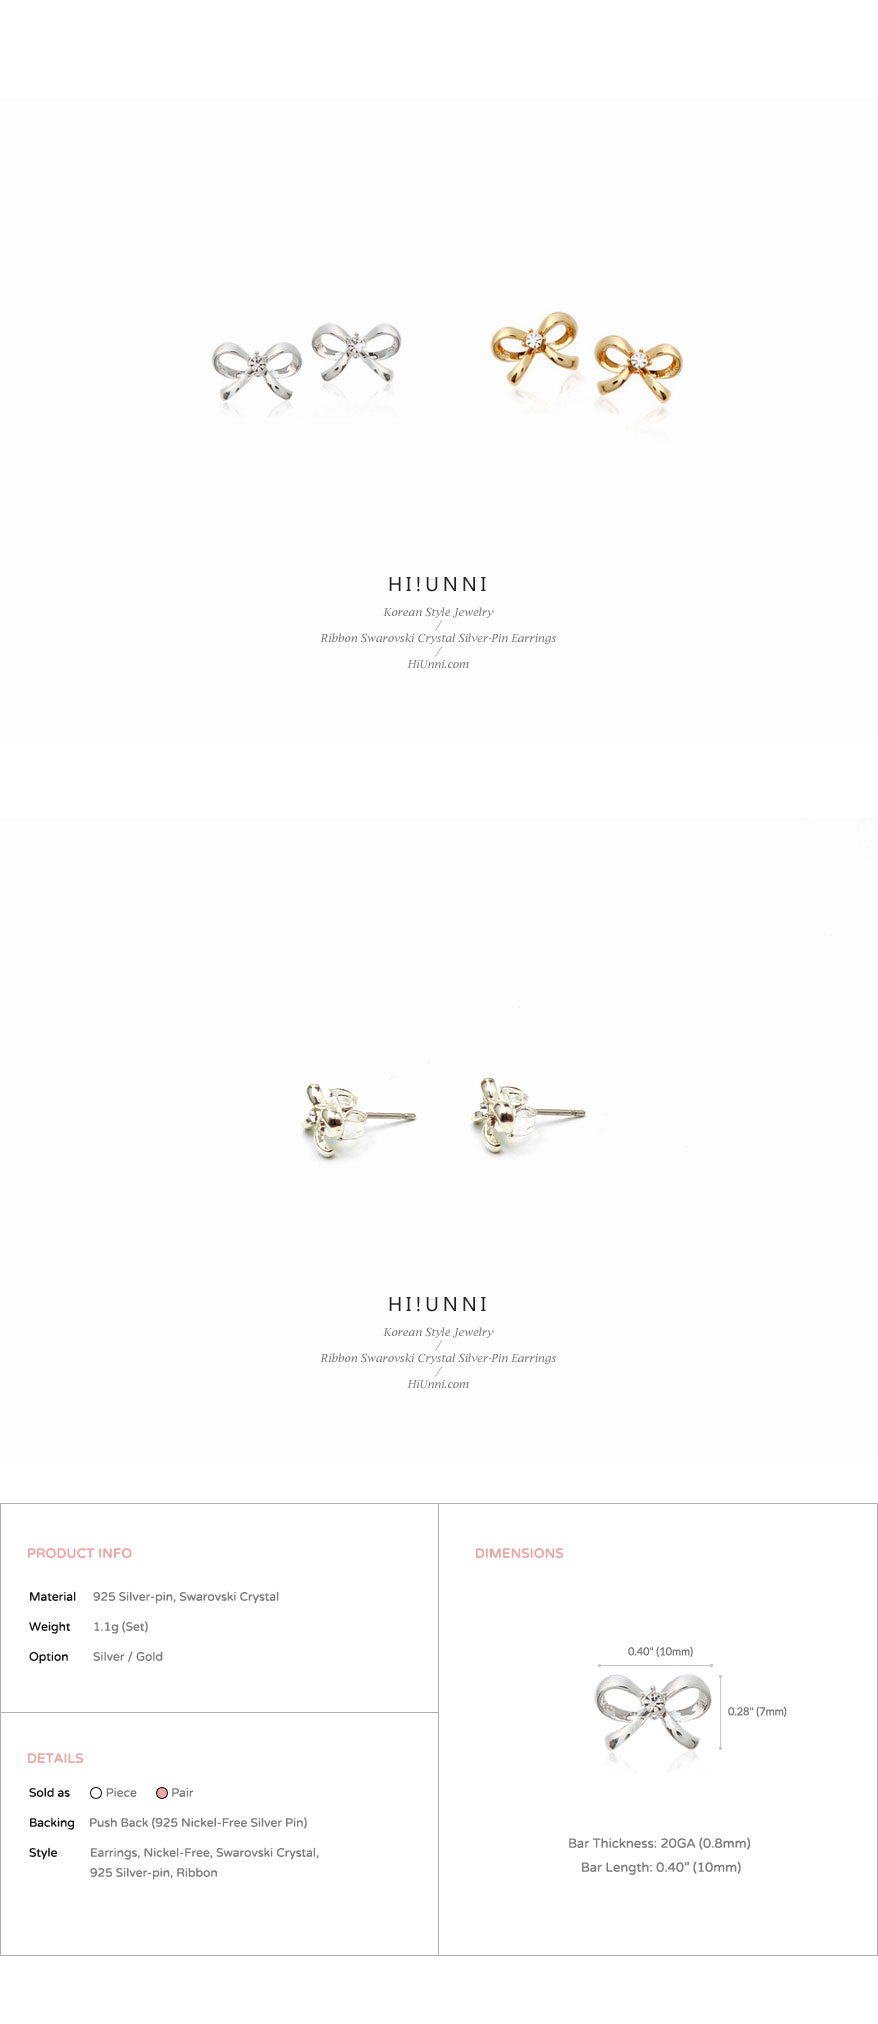 accessories_ear_stud_earrings_korean_asian_style_jewelry_Nickel-Free_titanium_swarovski_crystal_ribbon_925_silver_3